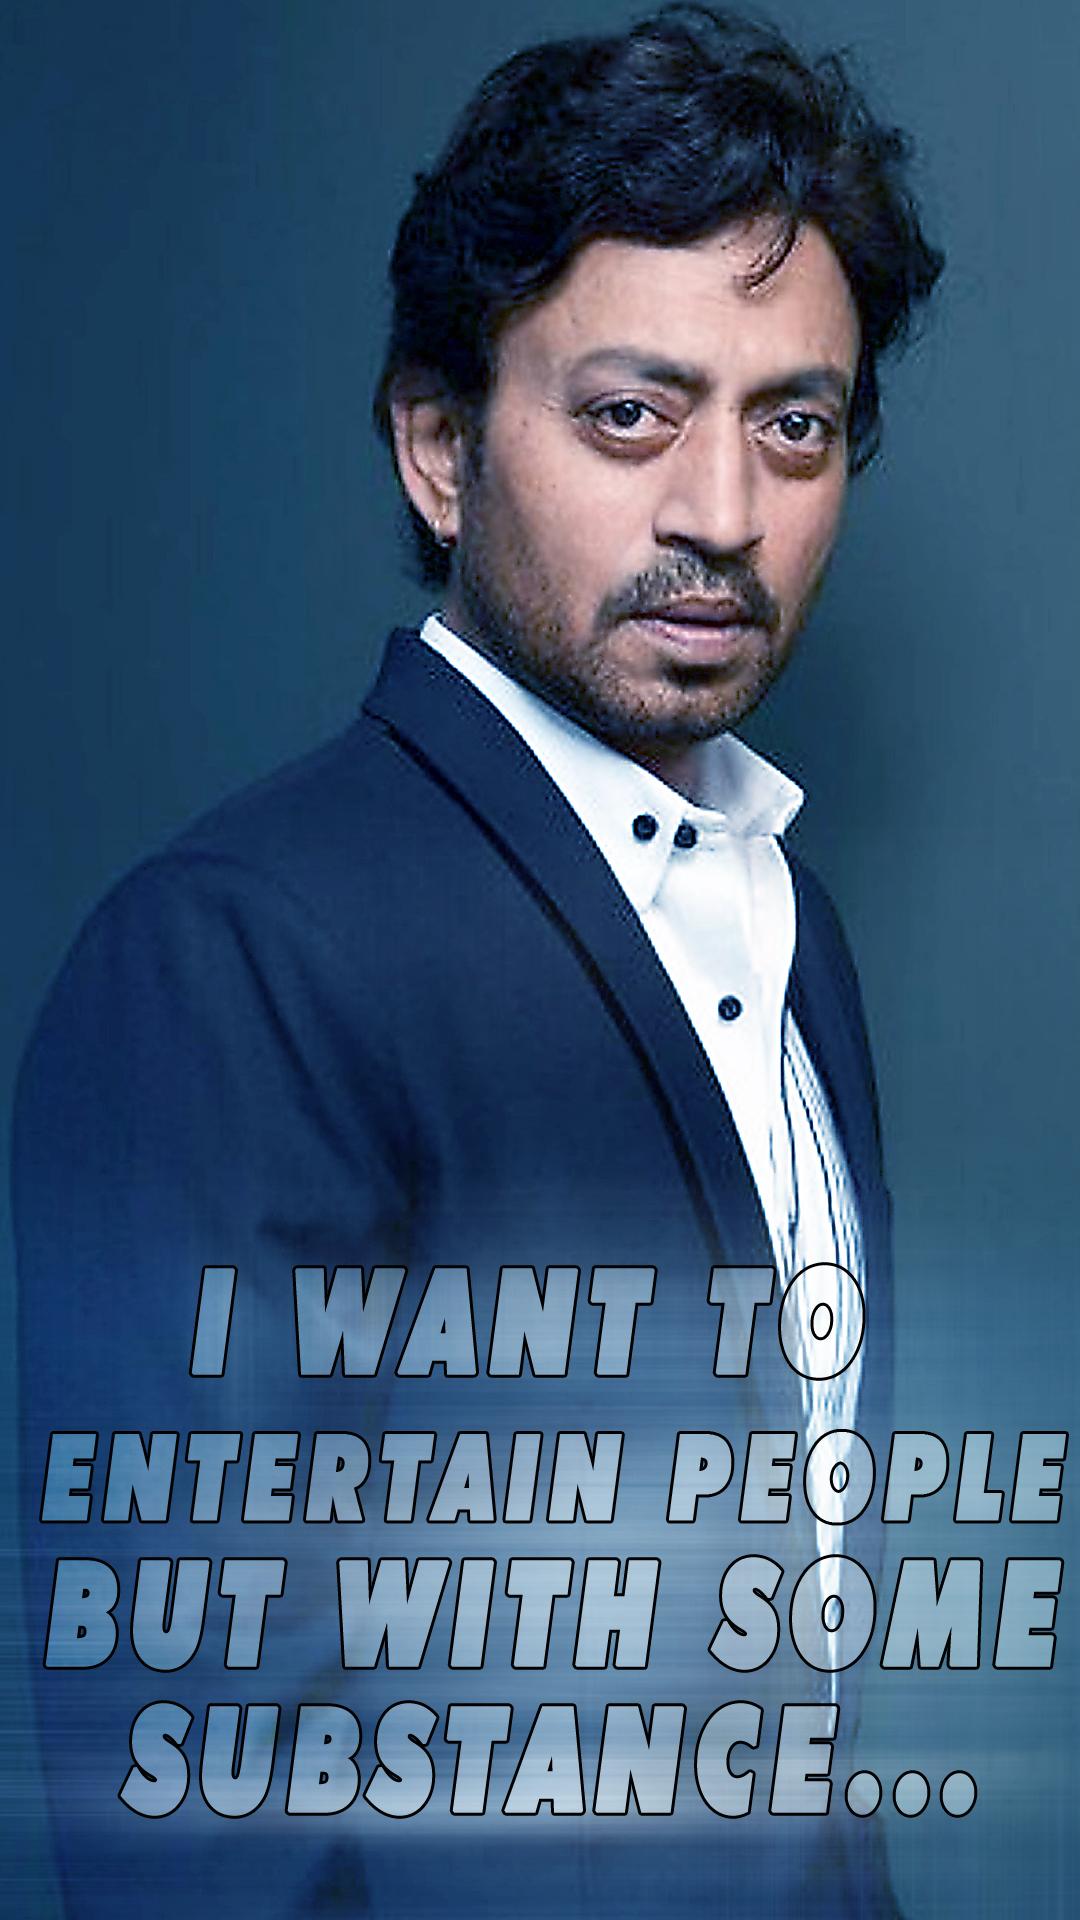 irrfan khan quotes mobile wallpaper full HD | Ghantee